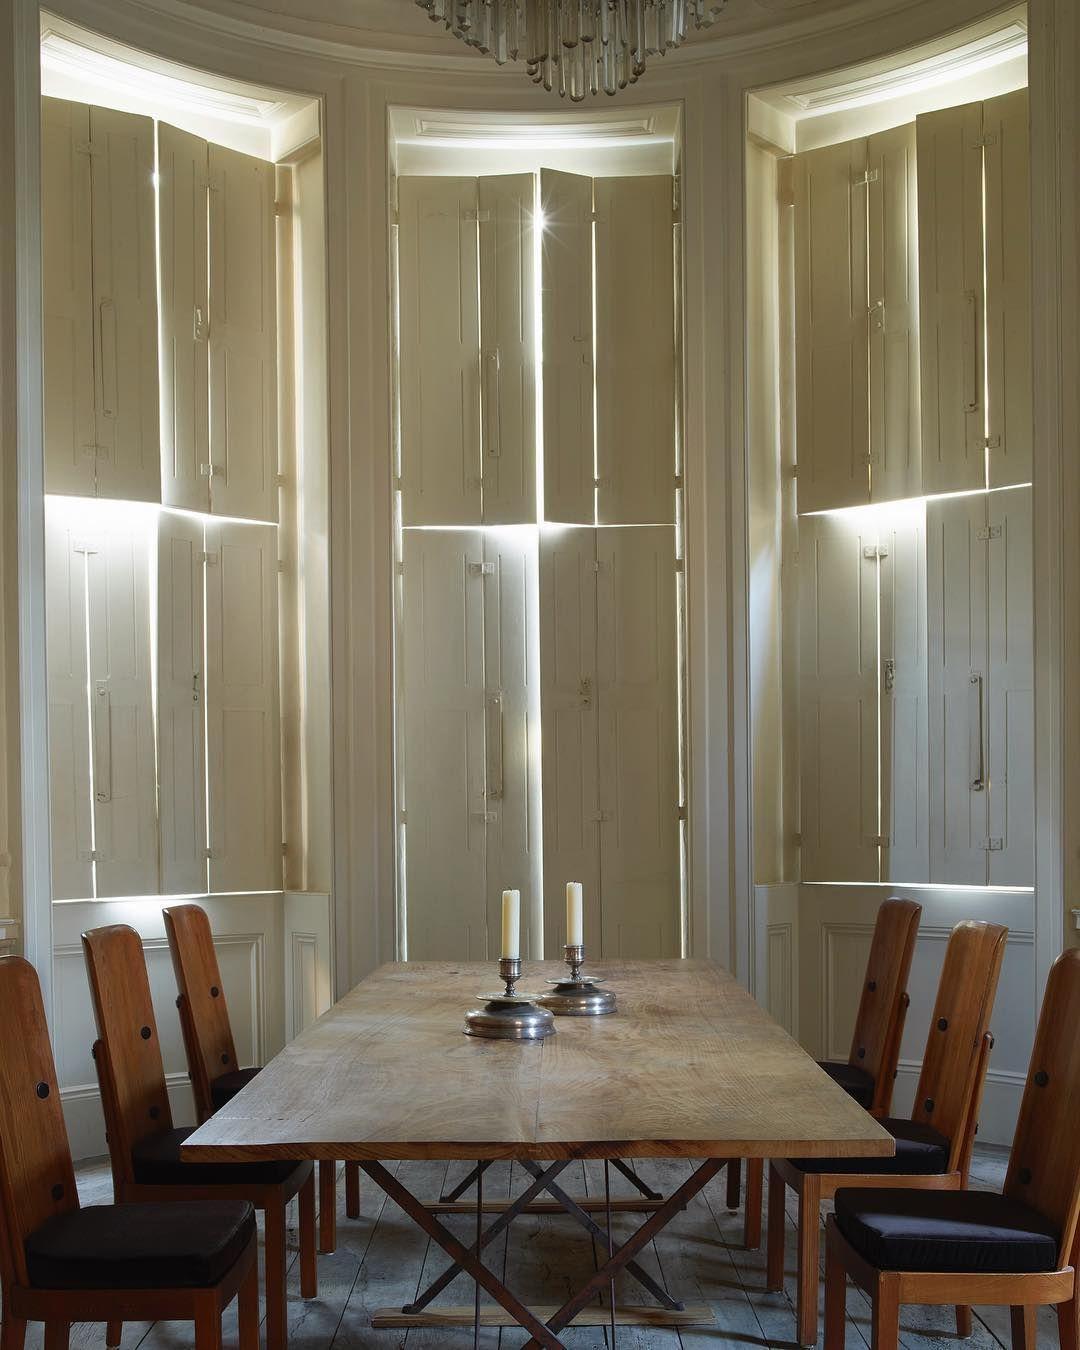 Rose Uniacke Rose Uniacke Dining Room Design Interior Styling